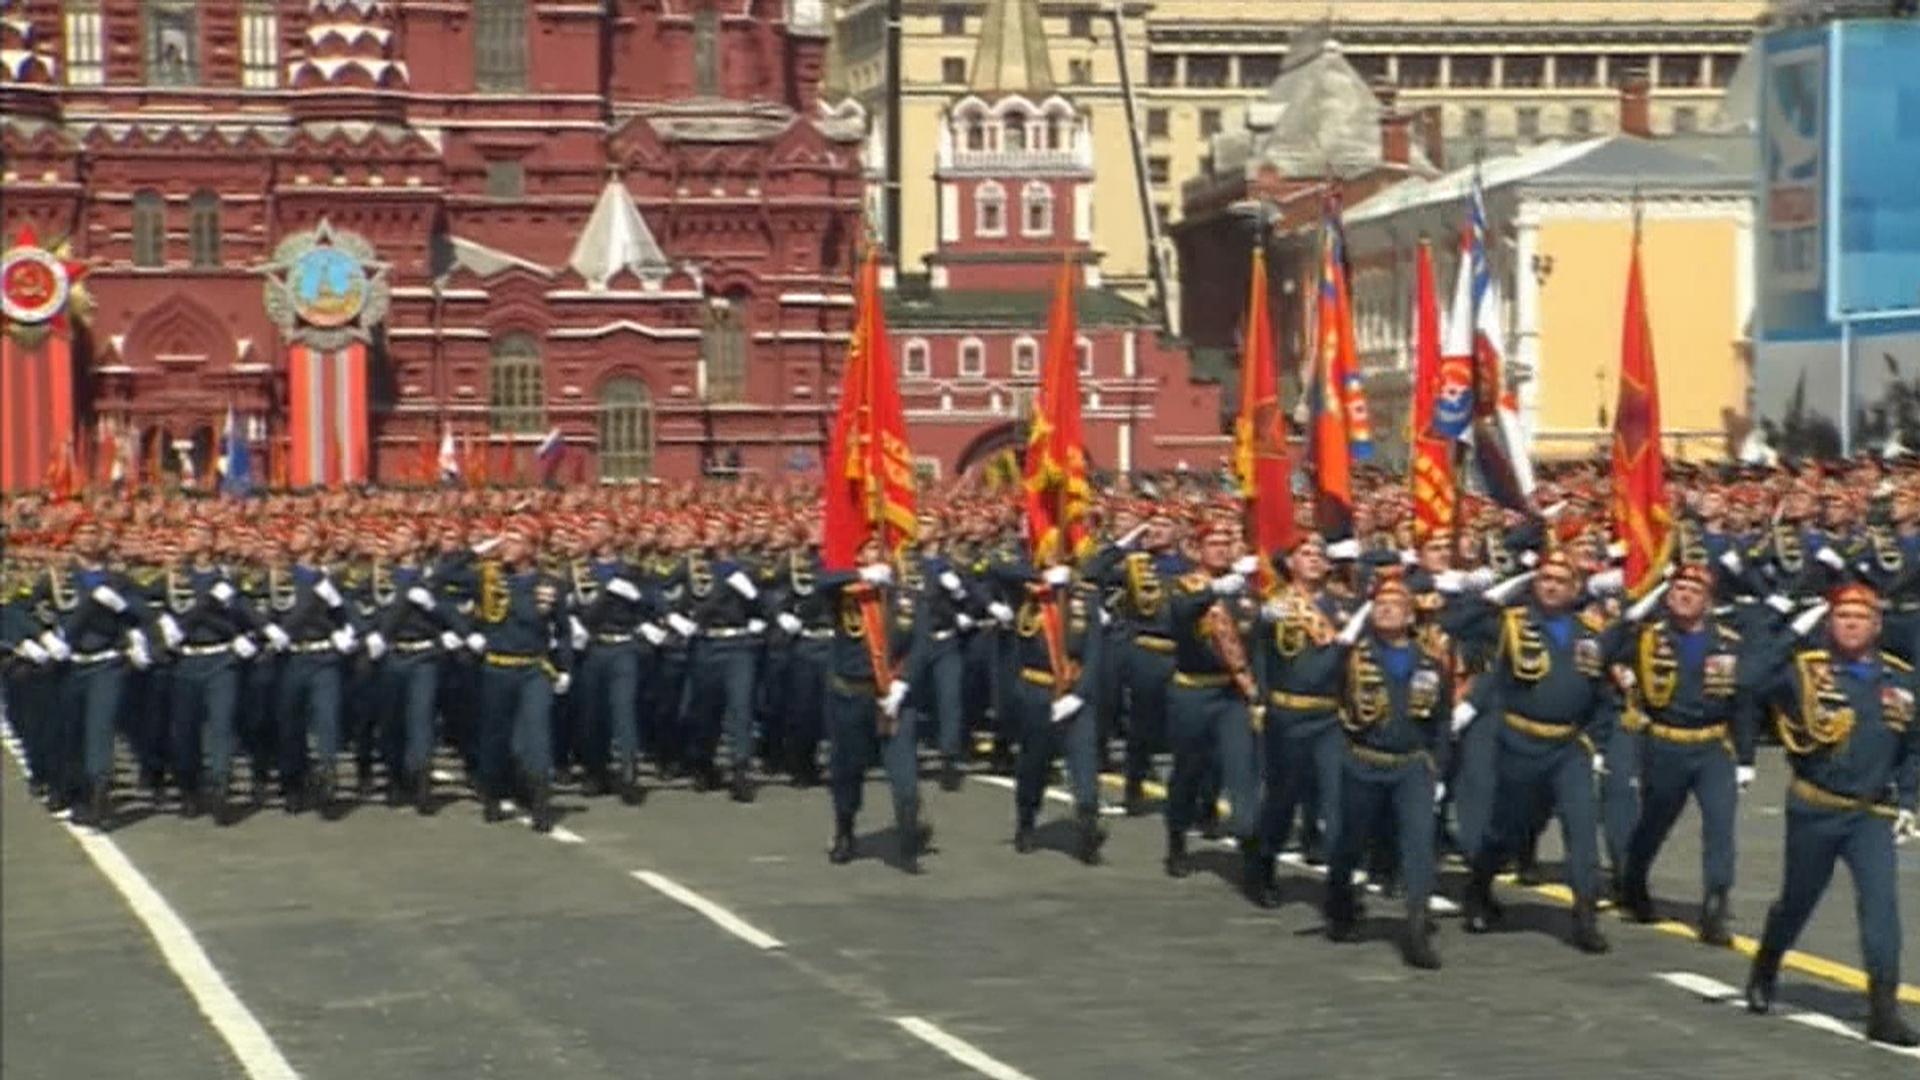 Putin Takes Swipe at U.S. in Massive Red Square Military Parade